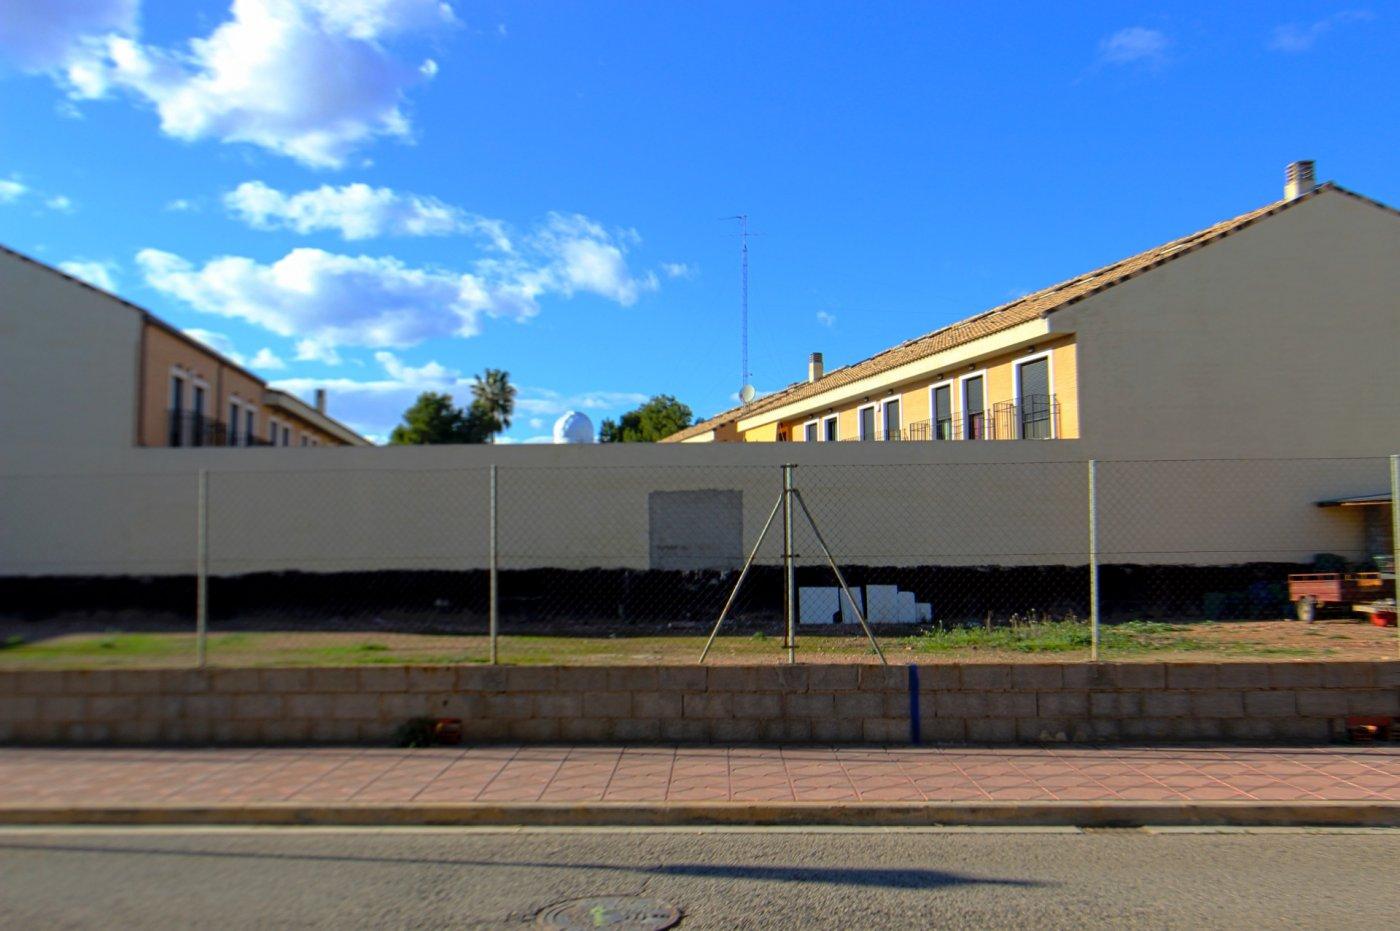 terreno-urbano en albuixech · albuixech 69000€